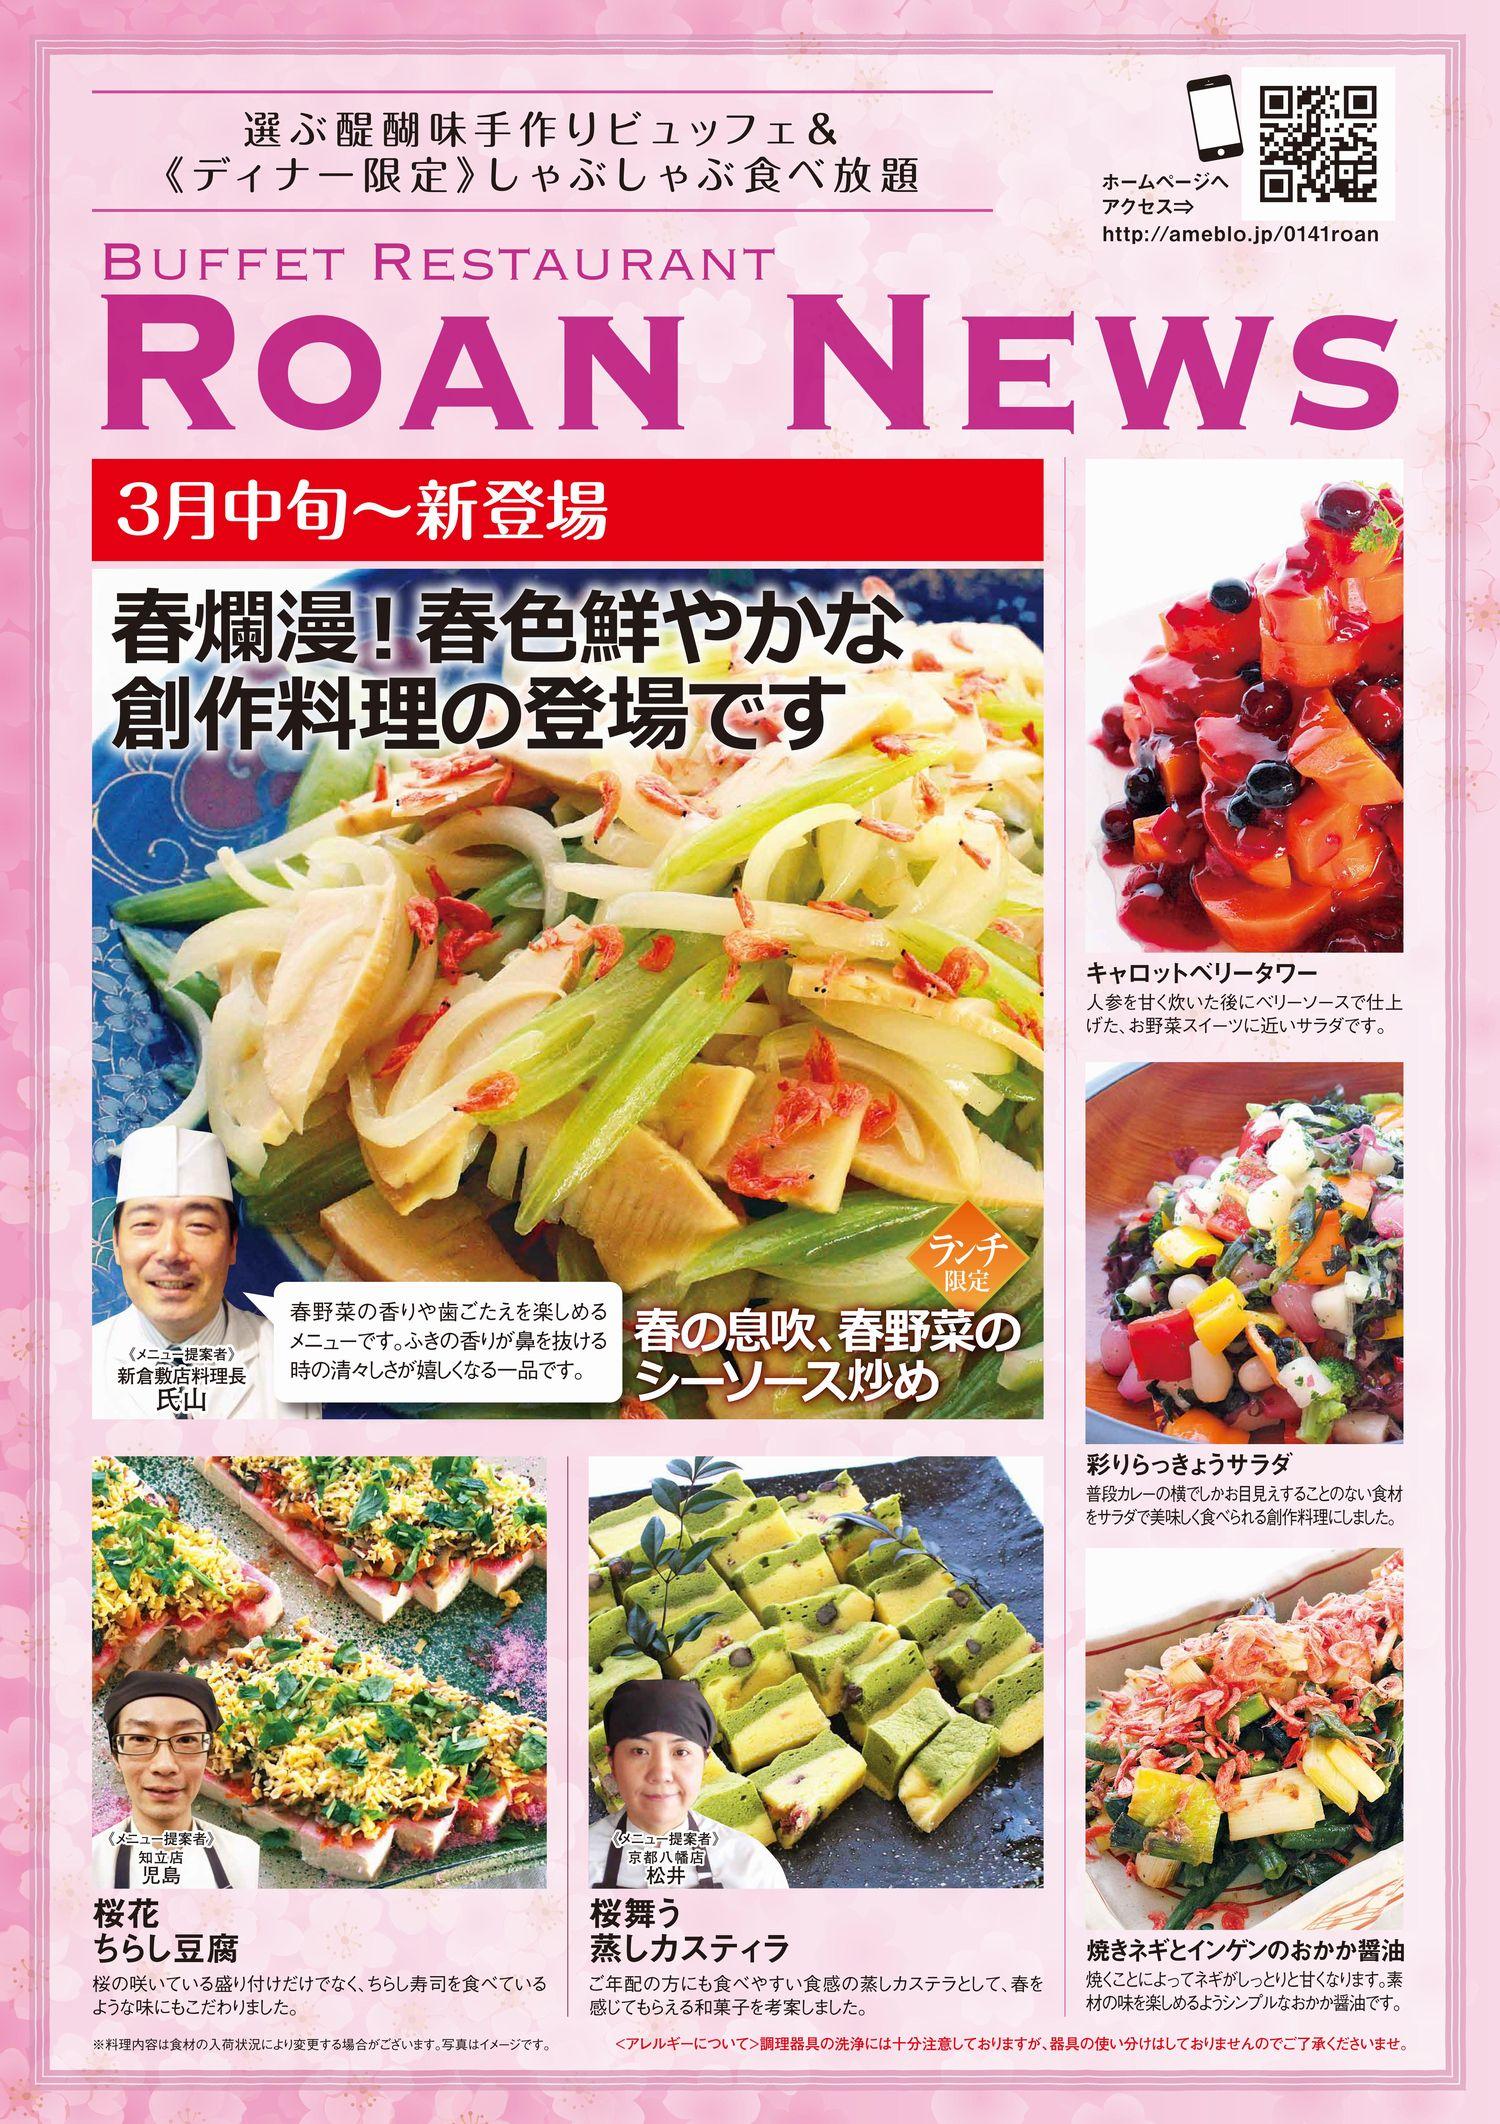 Roan News 3月